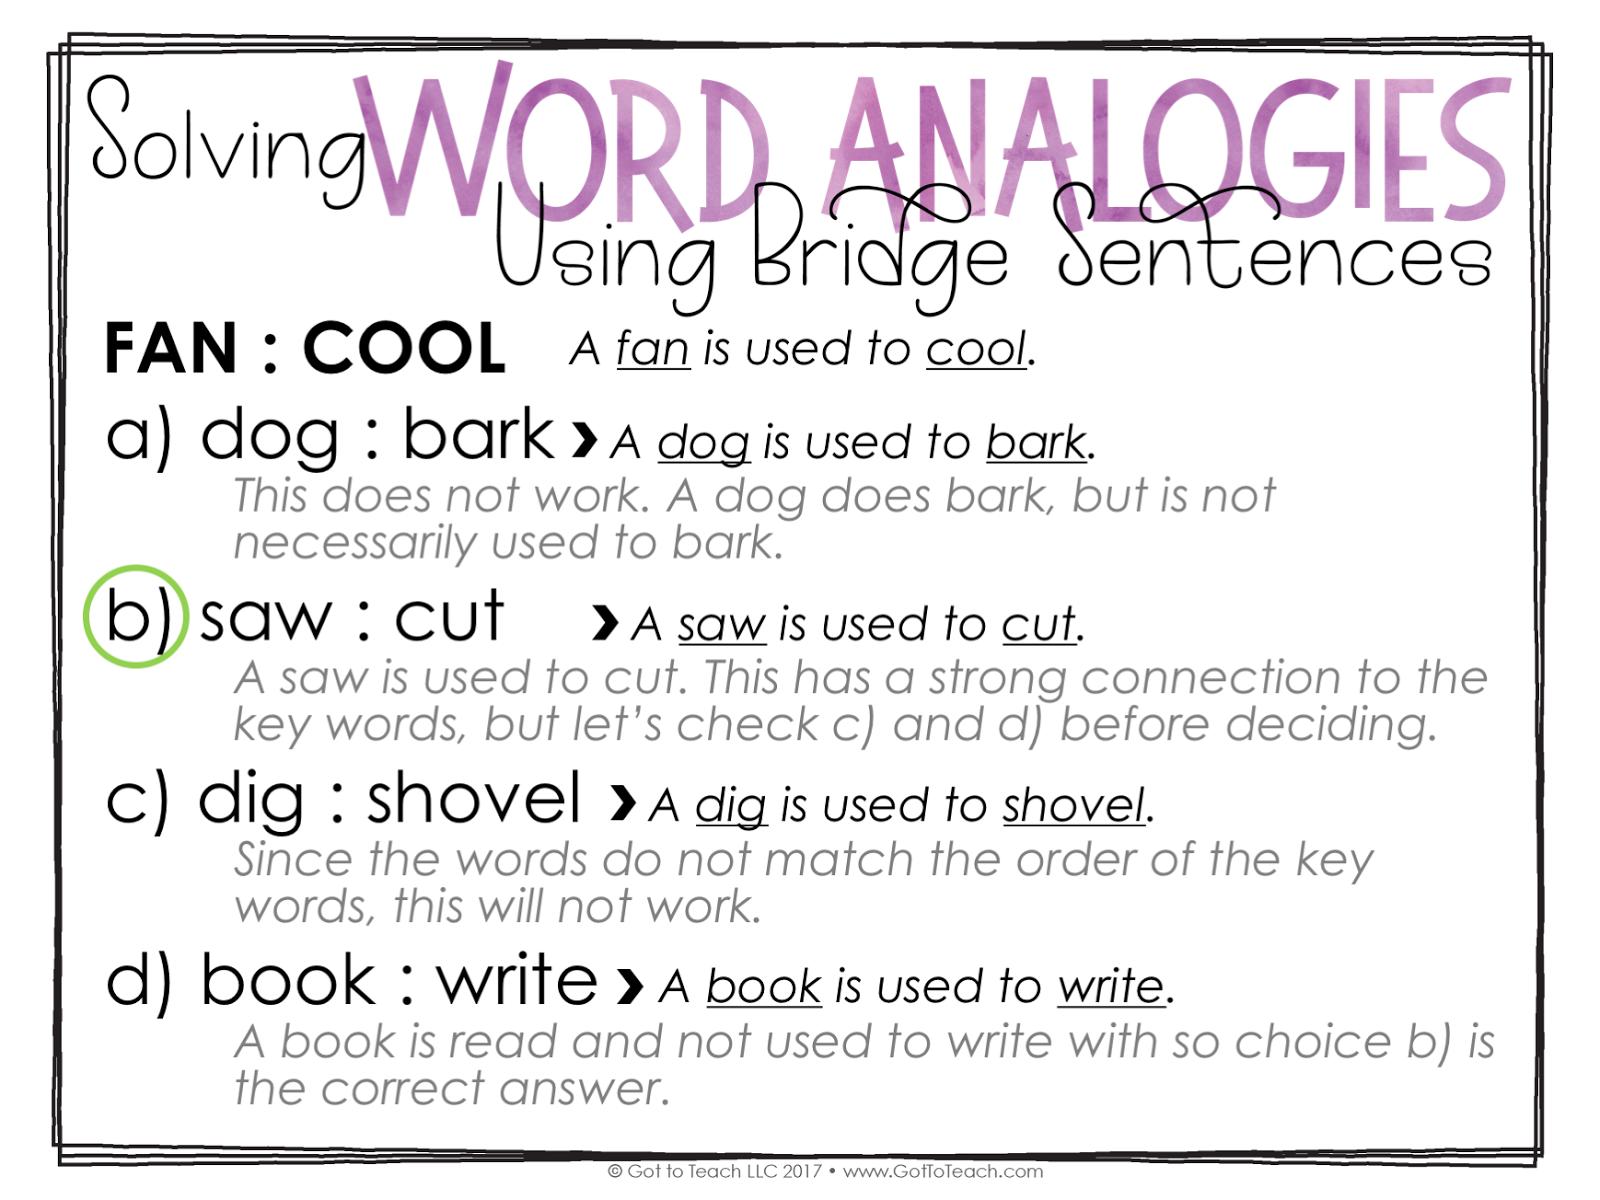 how to write a bridge sentence and analogy